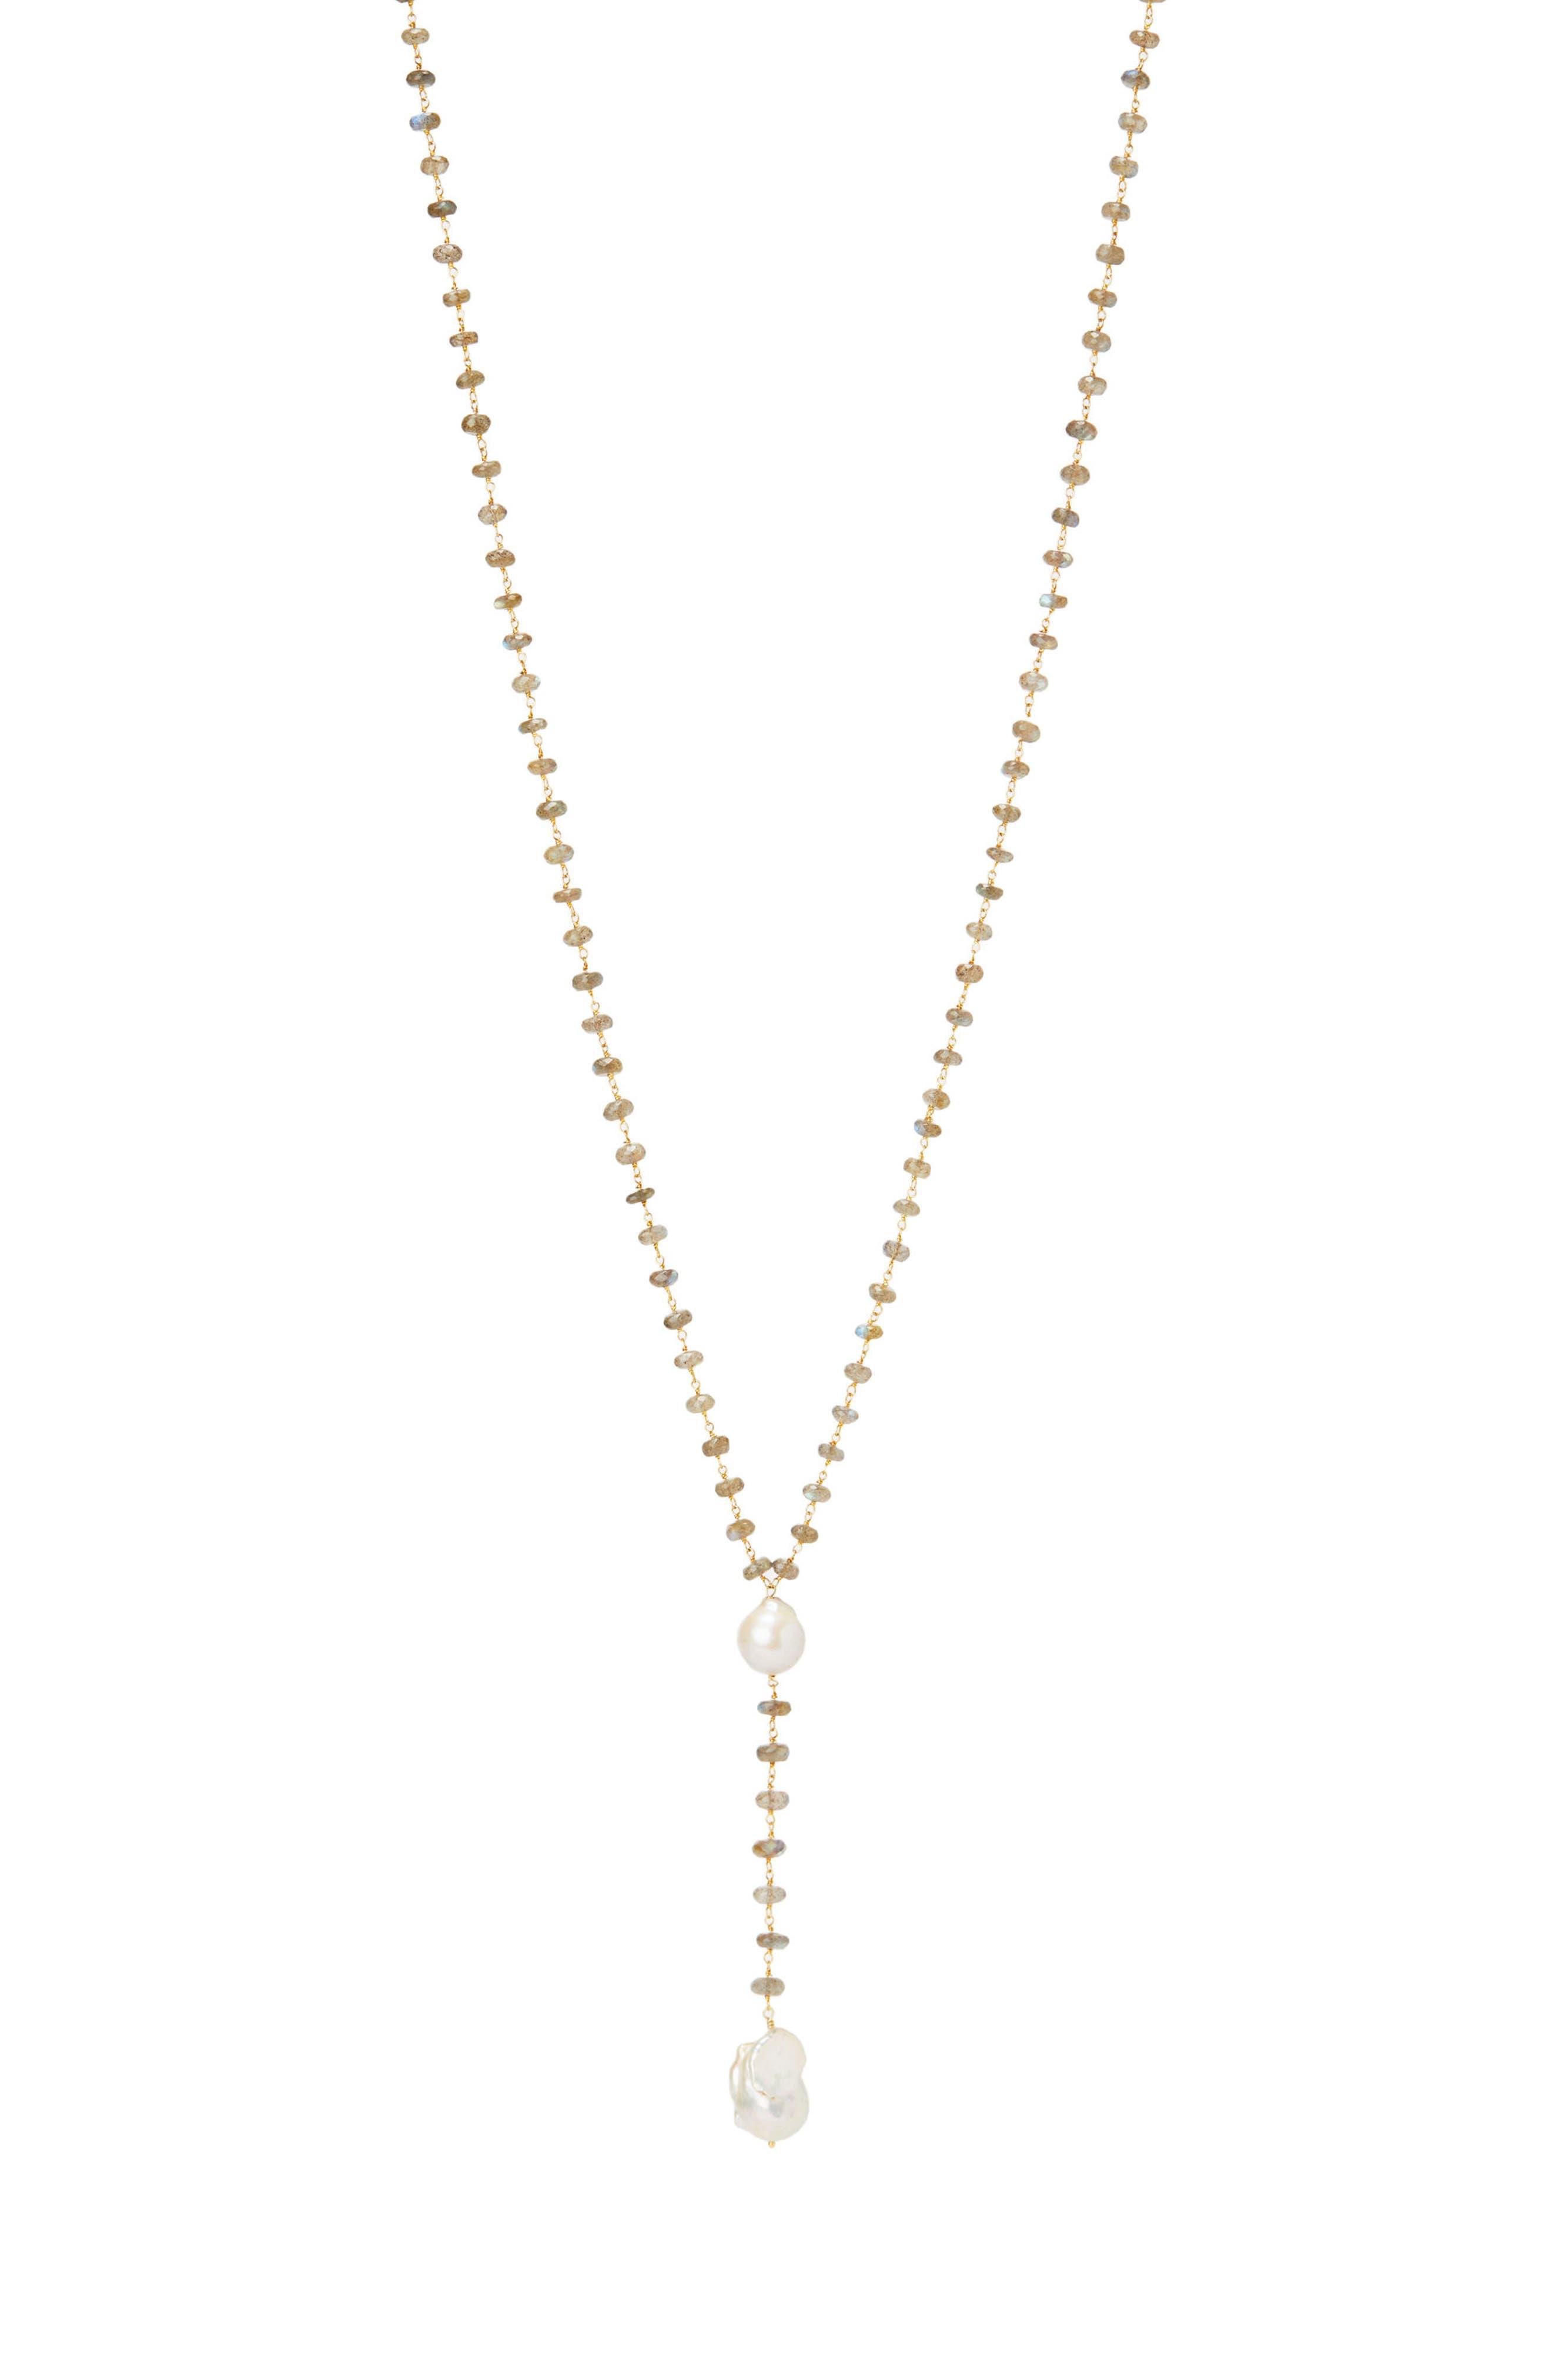 Main Image - Jemma Sands Bora Bora Semiprecious Stone & Baroque Pearl Y-Necklace